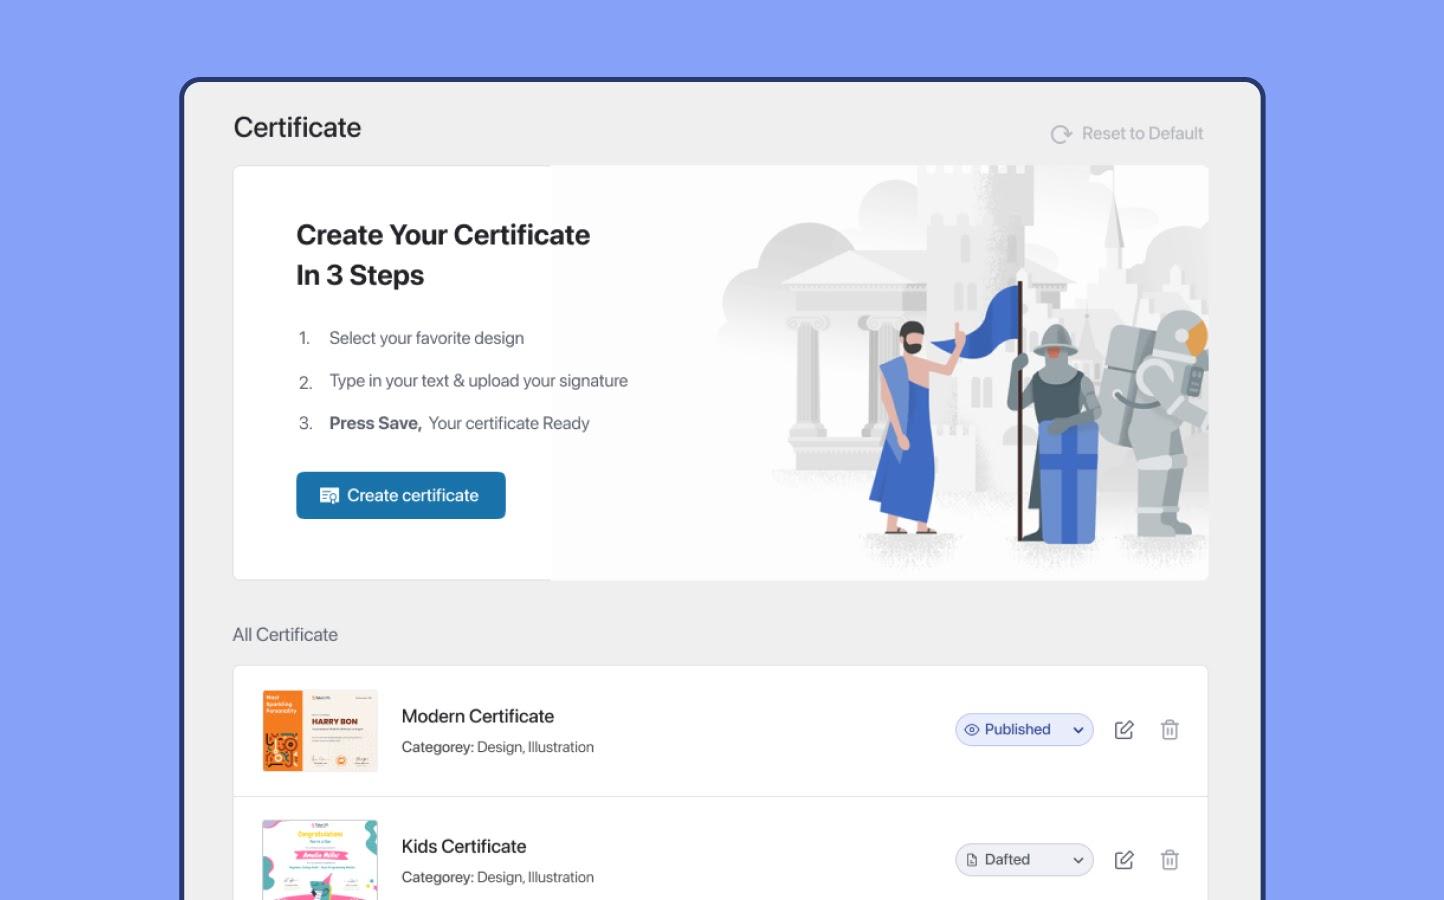 Certificate Setup